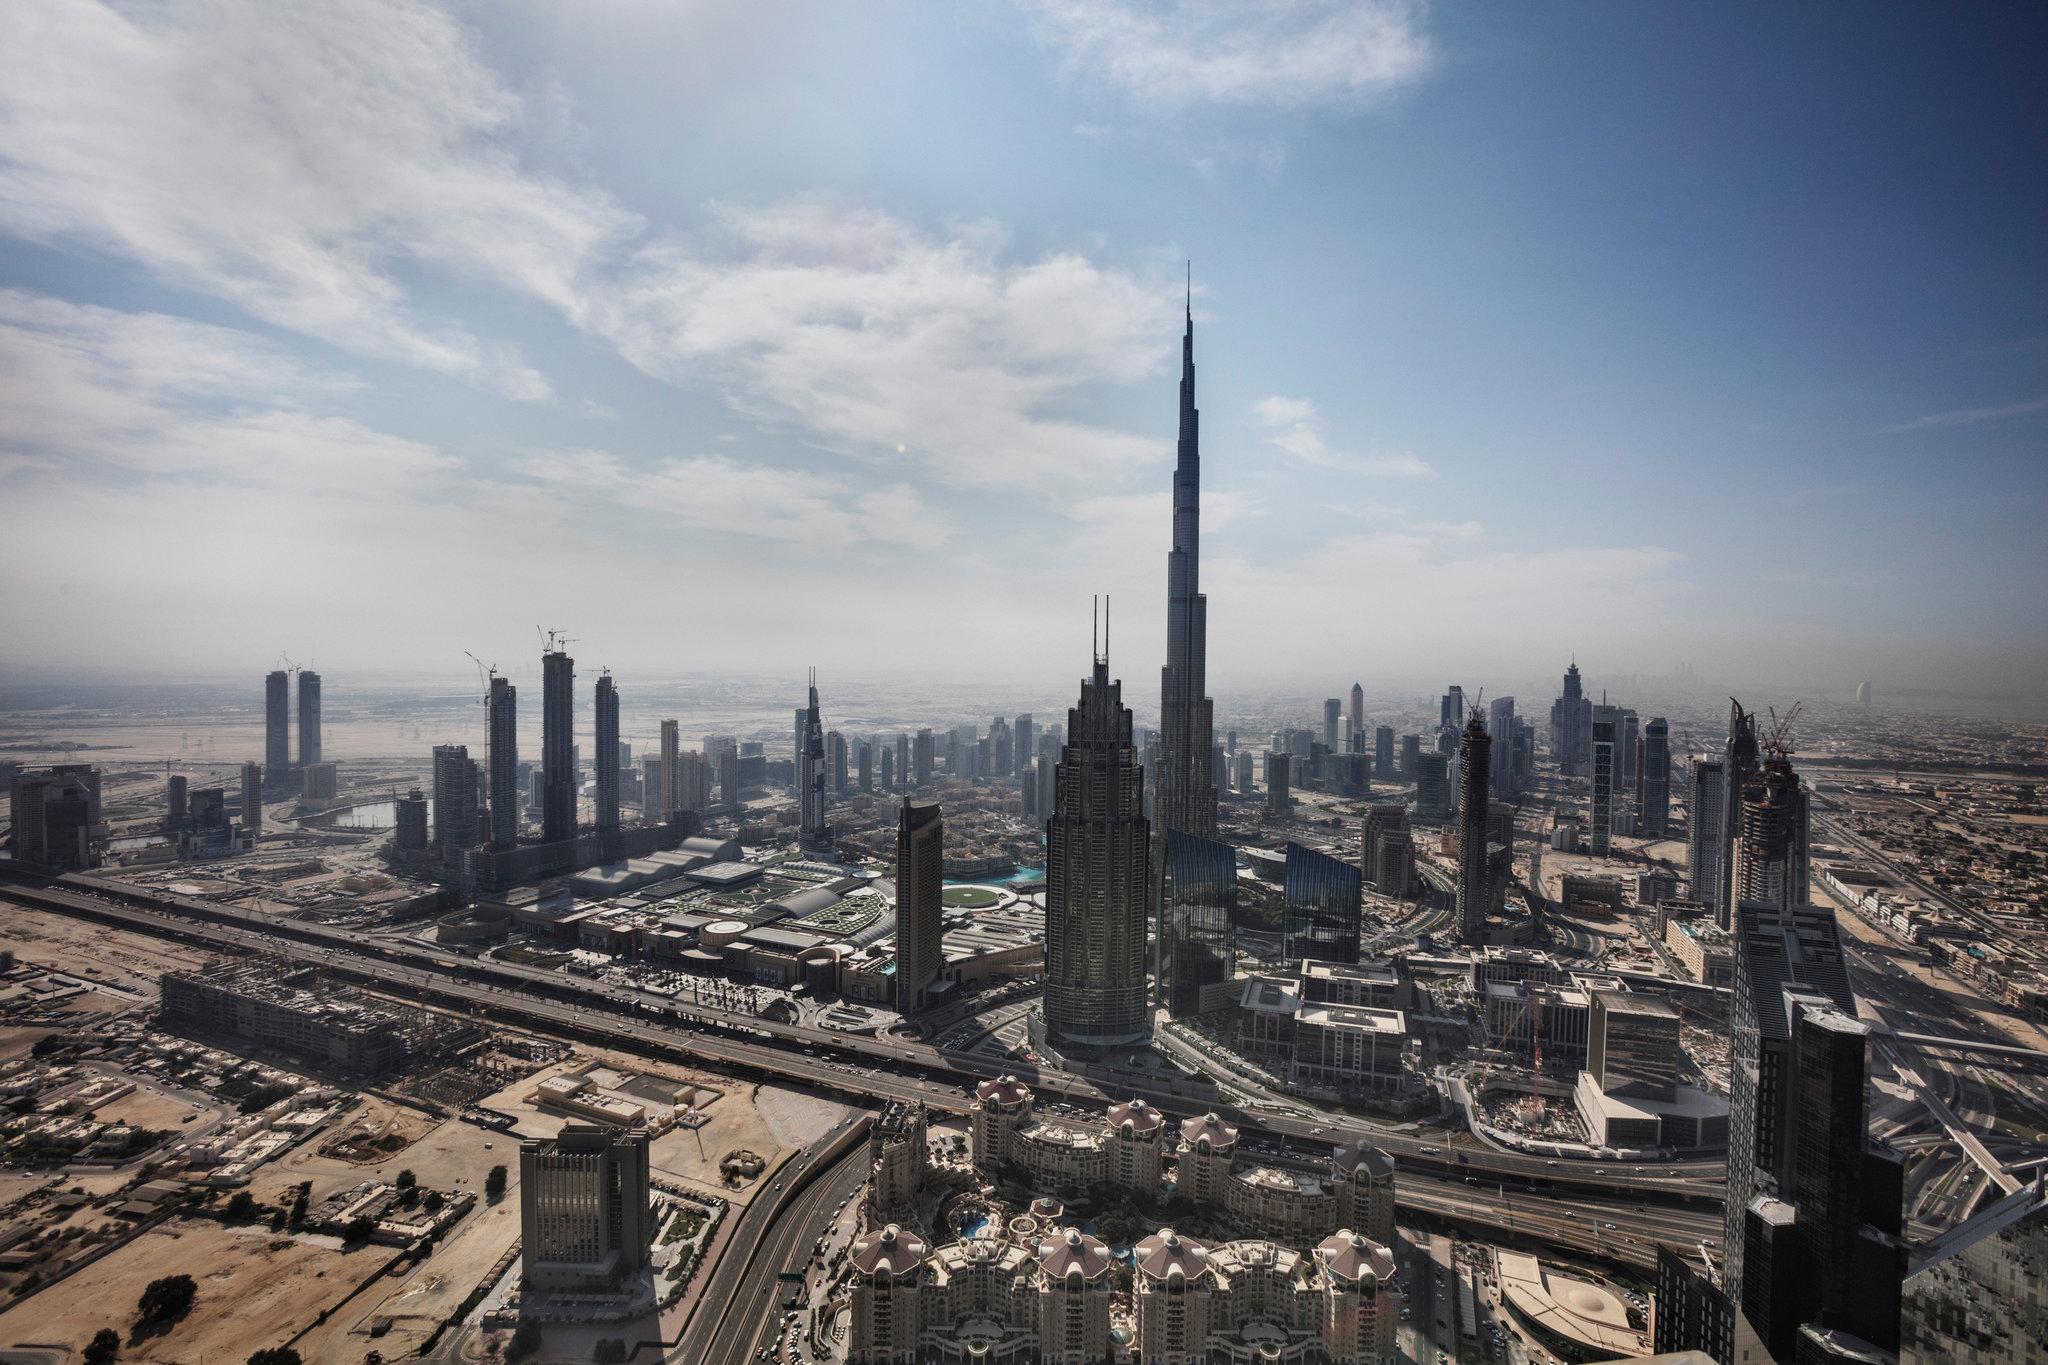 As Dubai S Skyline Adds A Trophy The Architect Calls It